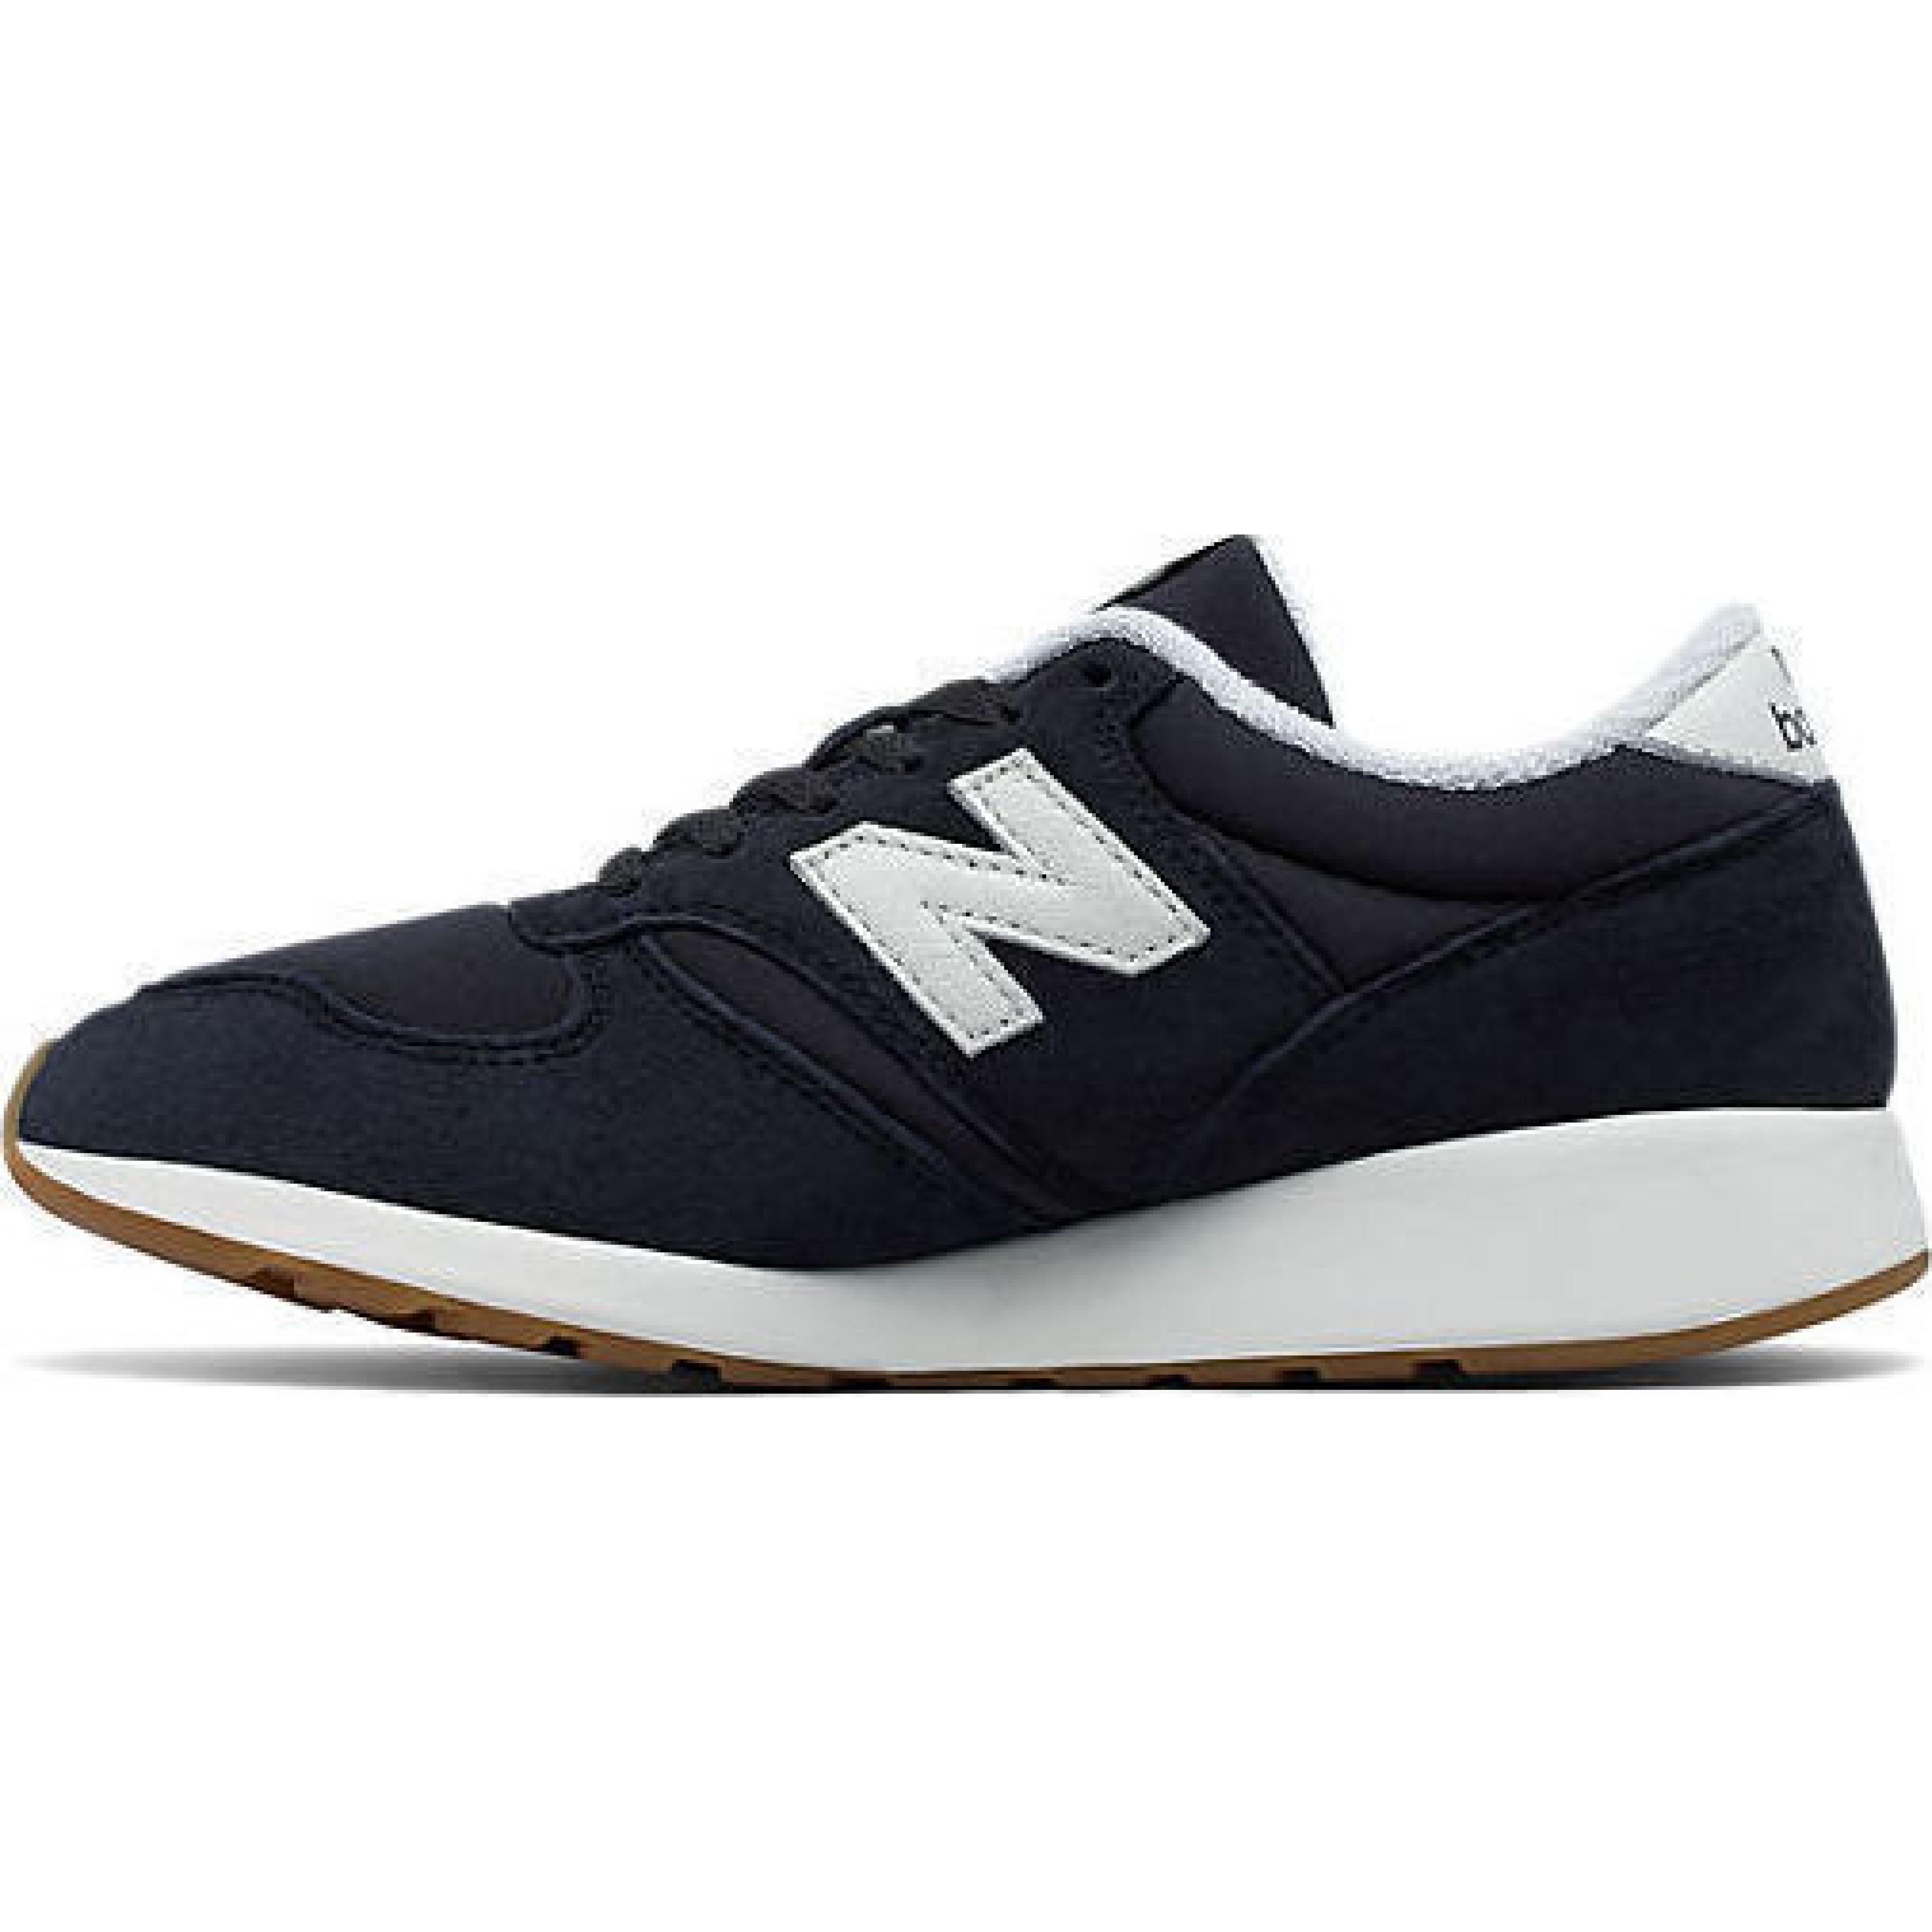 NEW BALANCE WOMEN 420 RE-ENGINEERED RUNNING SHOE WRL420RC Sneaker Black  US 7.5 - MySilkway.com (Azerbaijan) 0243dce82